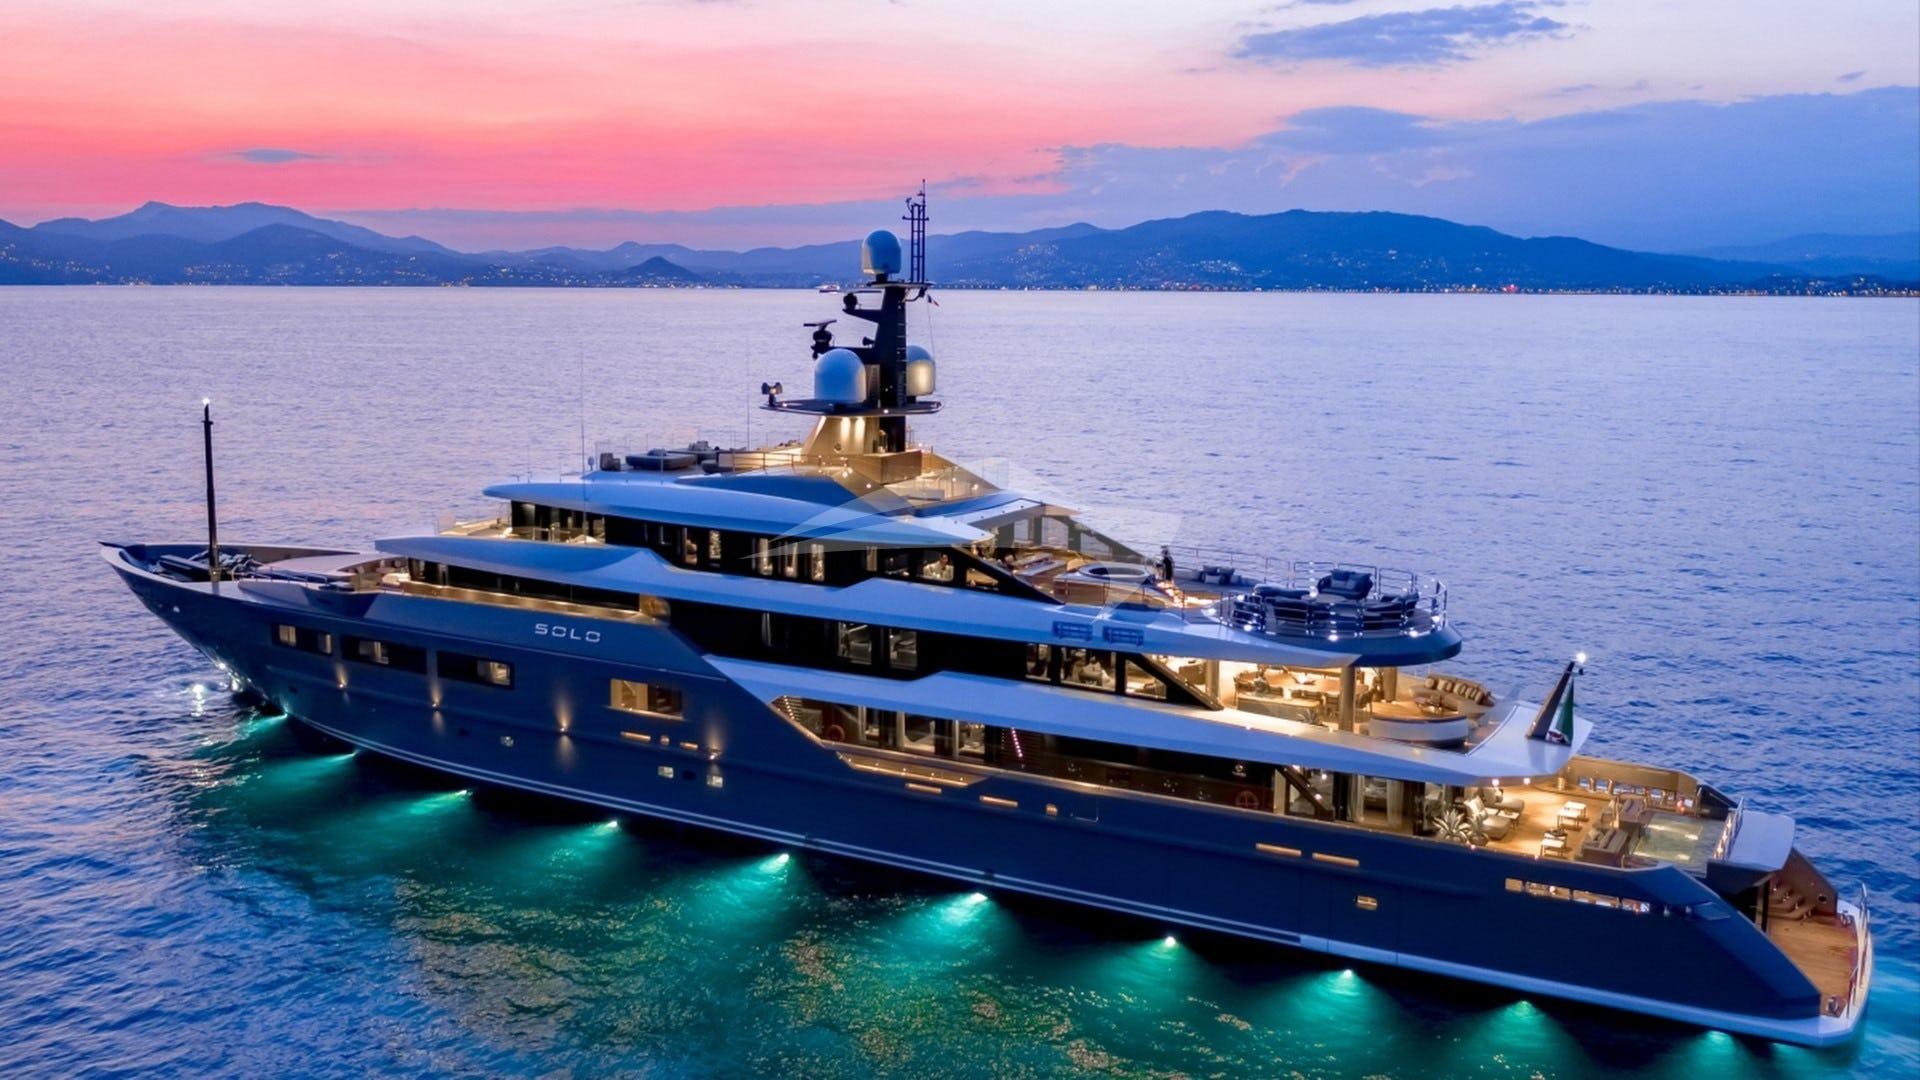 Yacht SOLO Charter Yacht